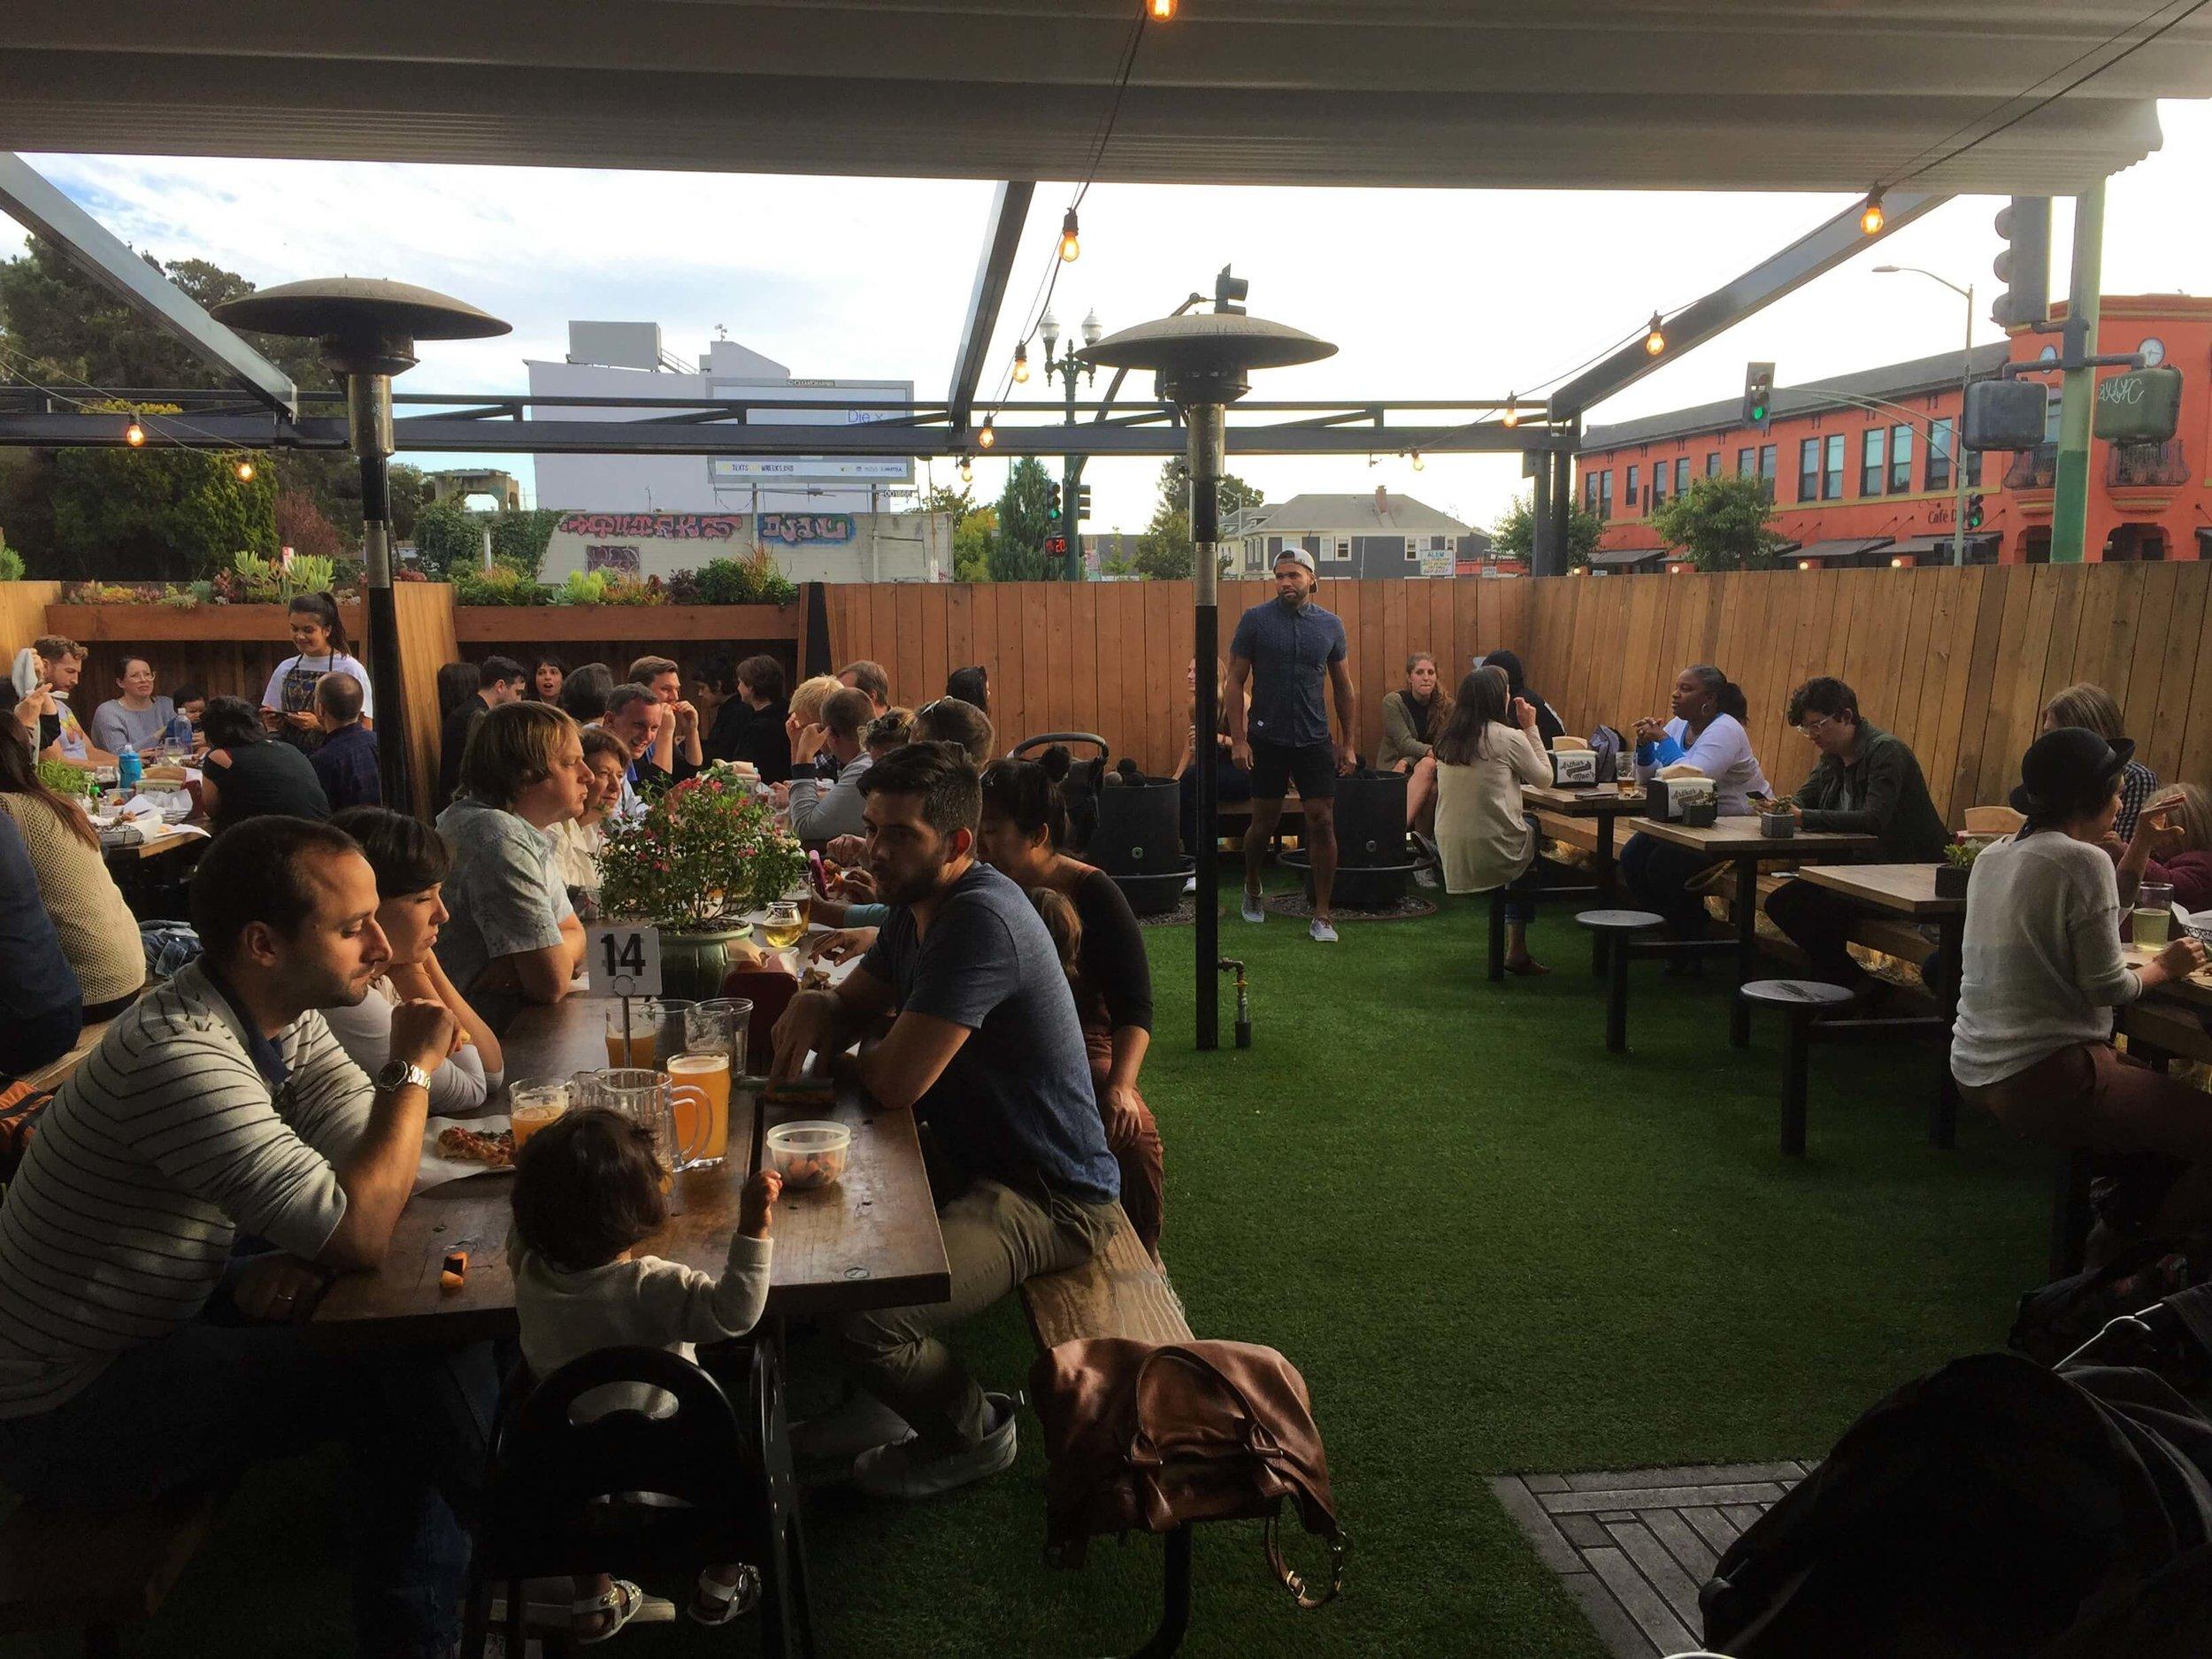 The family friendly beer garden at Arthur Mac. Best Bars in Oakland.